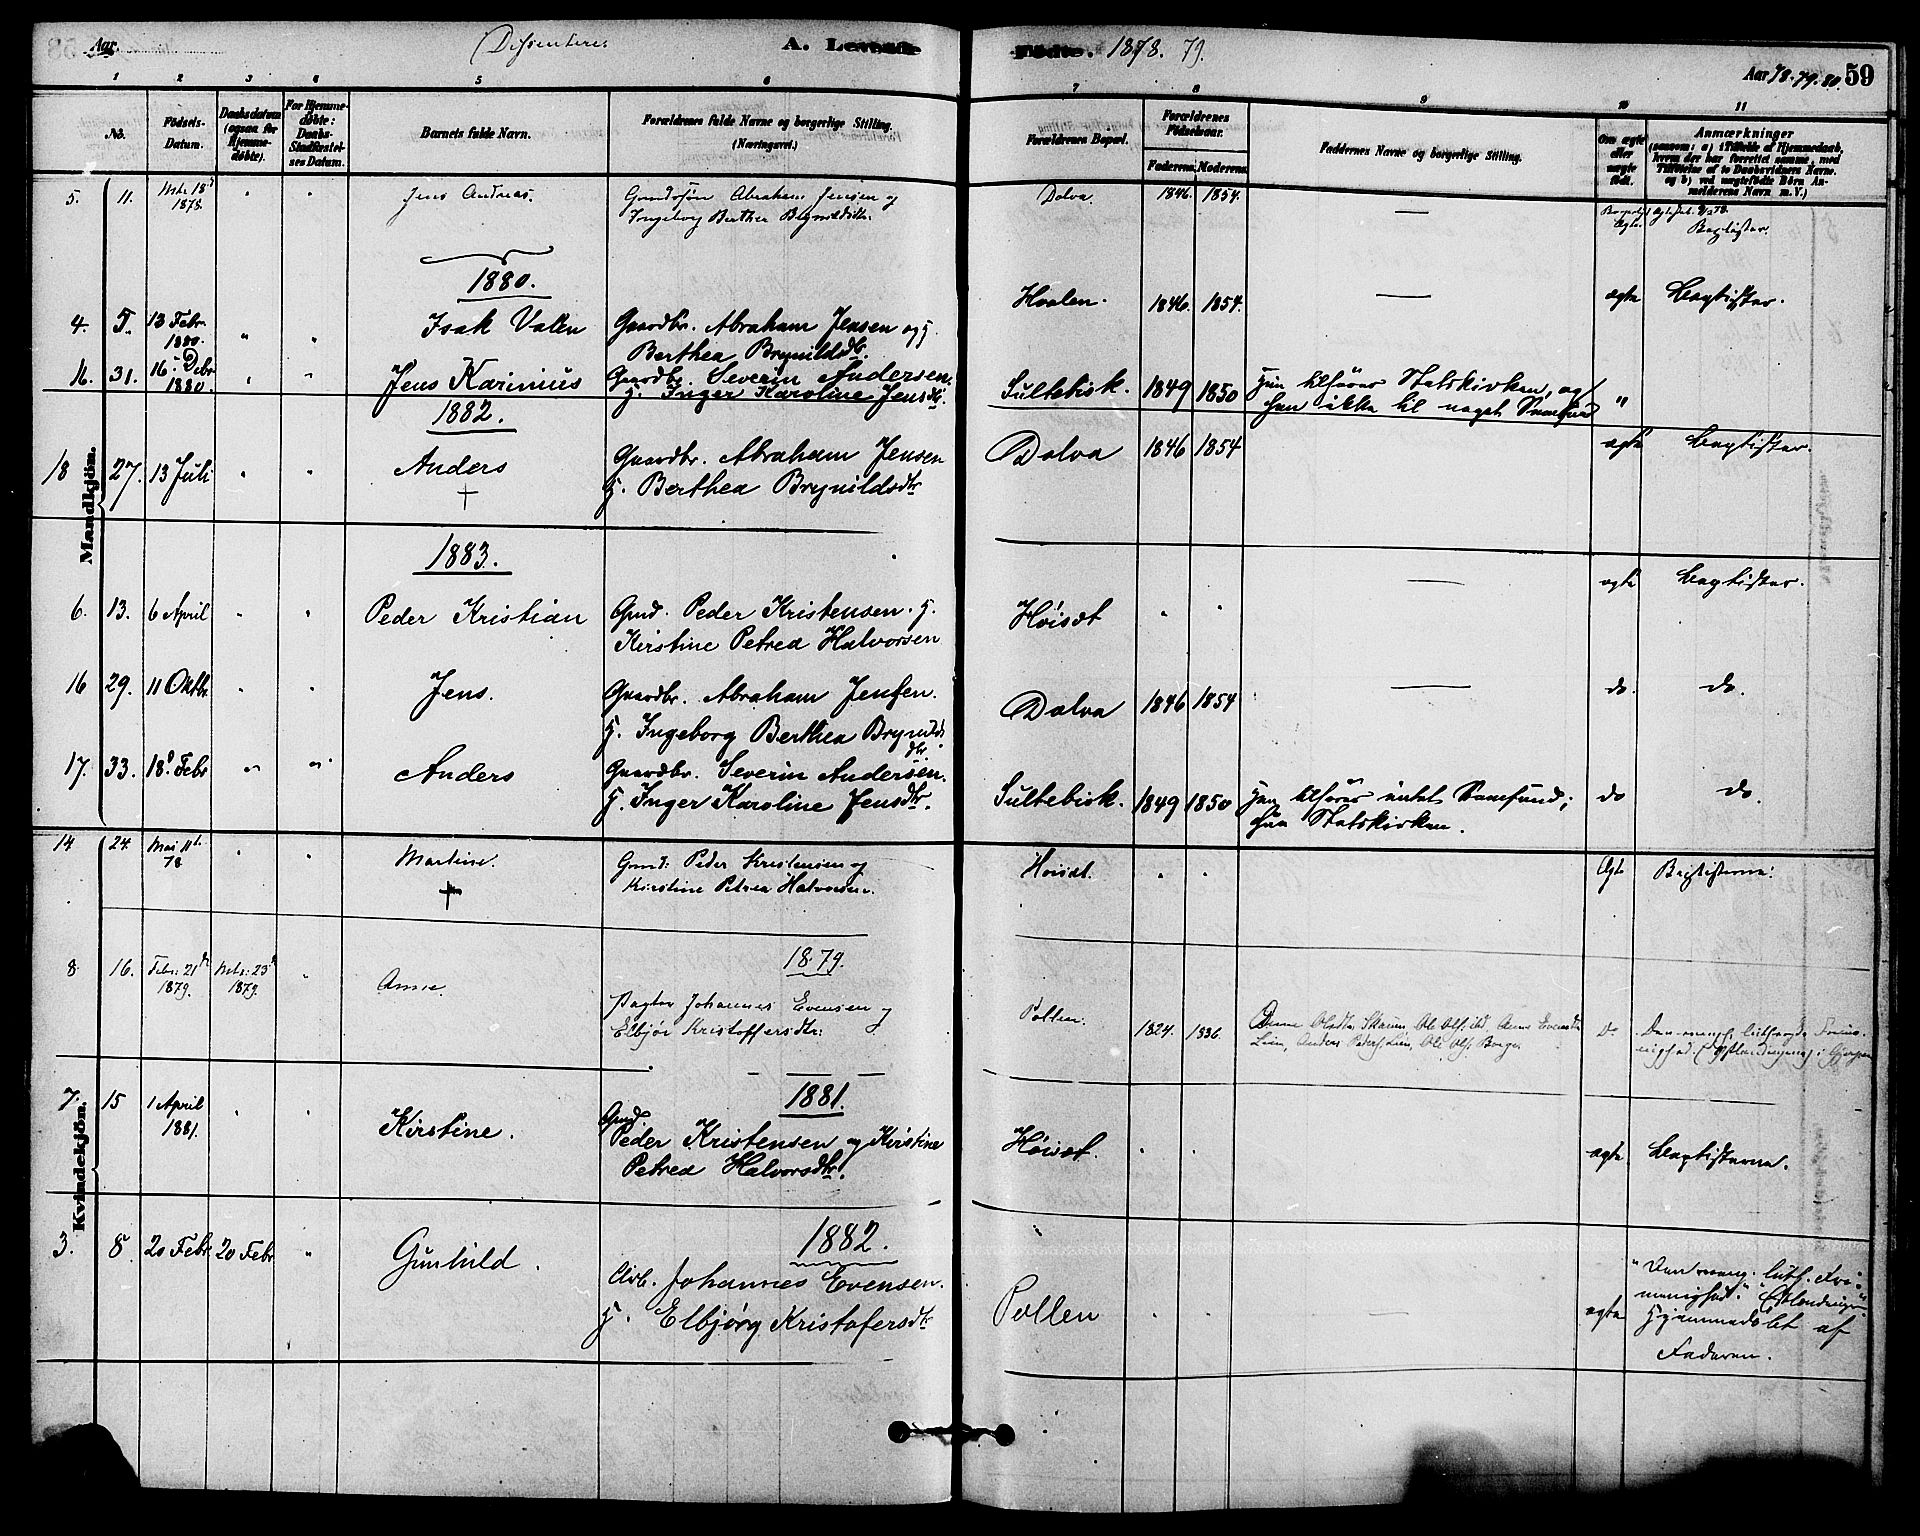 SAKO, Solum kirkebøker, F/Fb/L0001: Ministerialbok nr. II 1, 1877-1892, s. 59